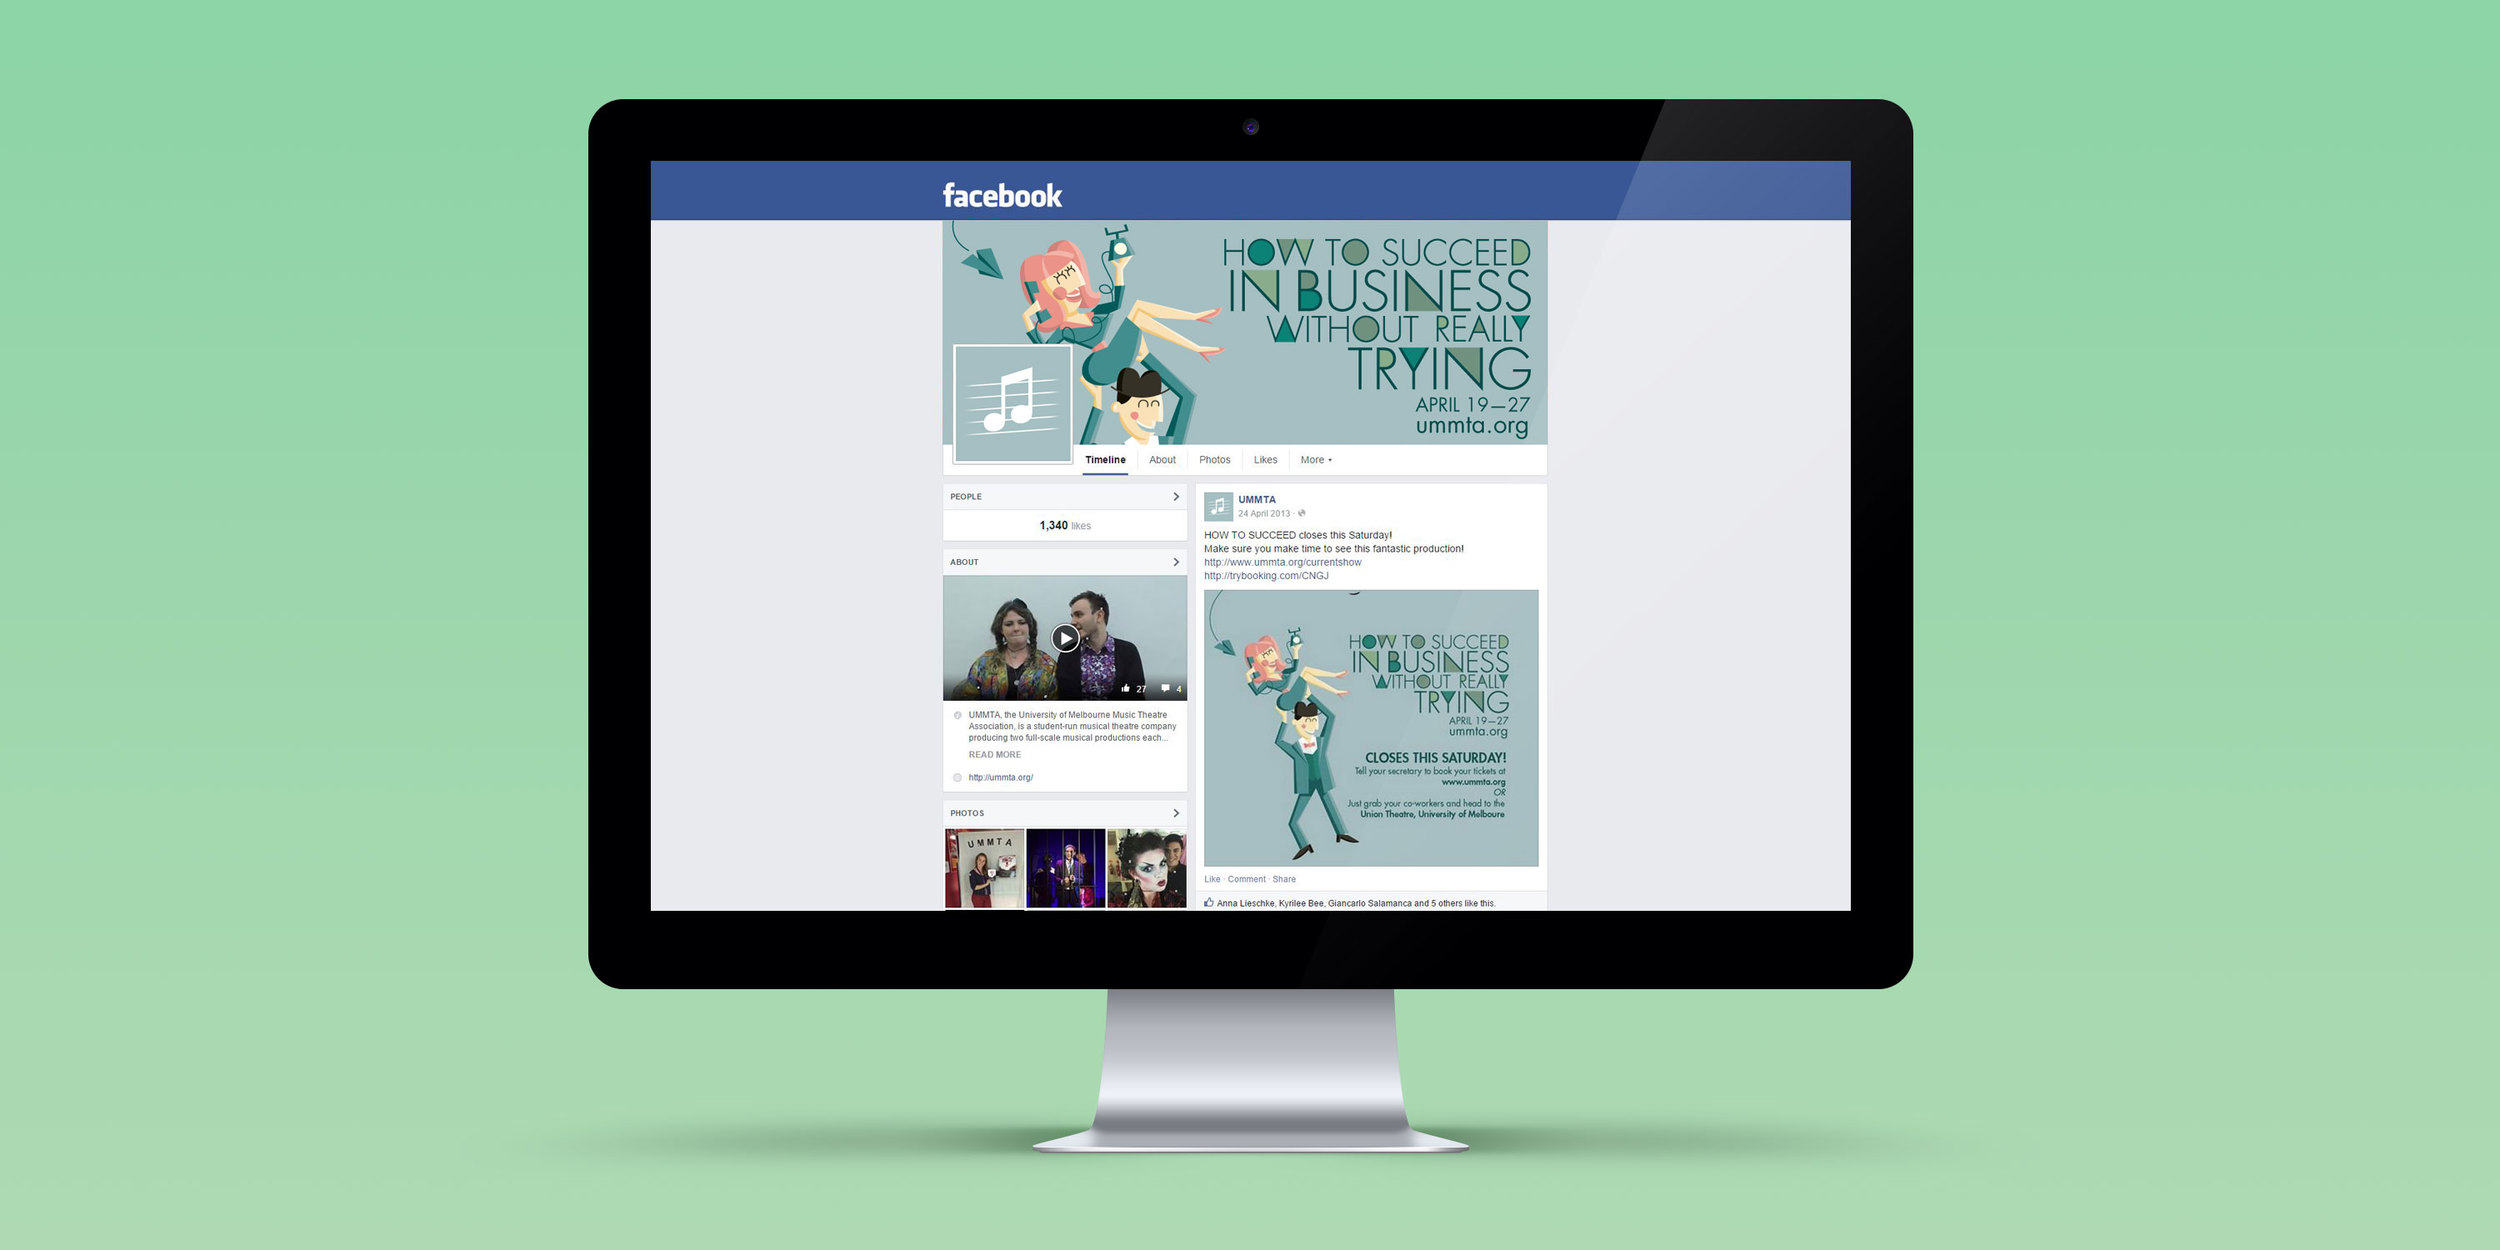 HowToSucceed-Facebook.jpg